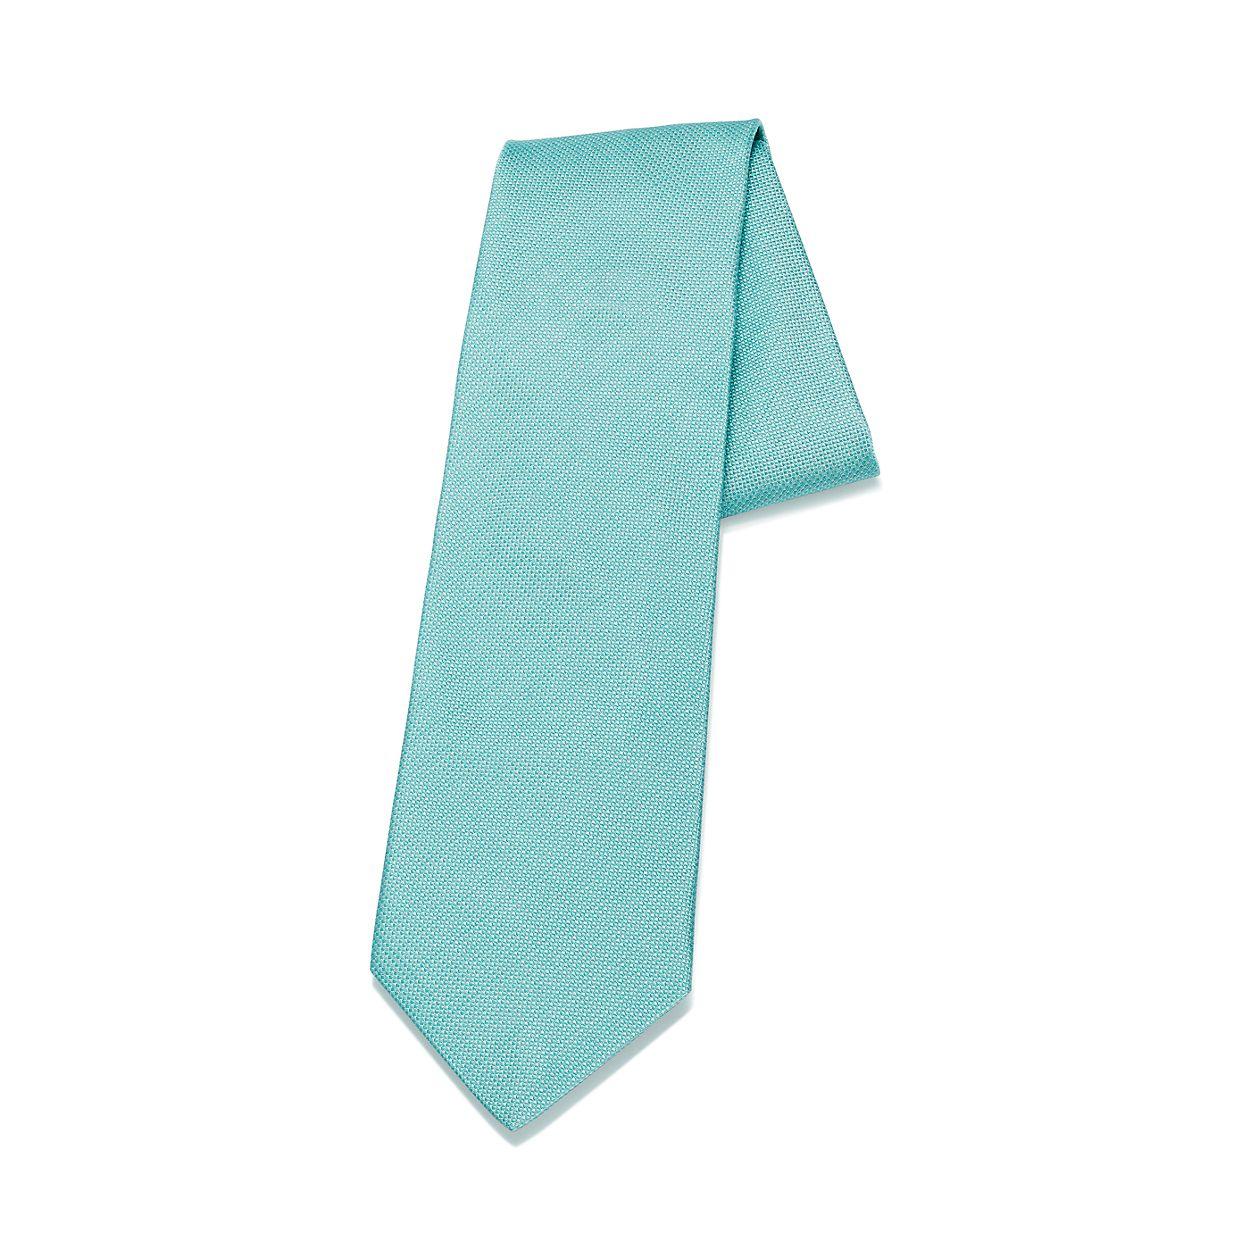 Diamond Point Tie In Tiffany Blue Silk Tiffany Co